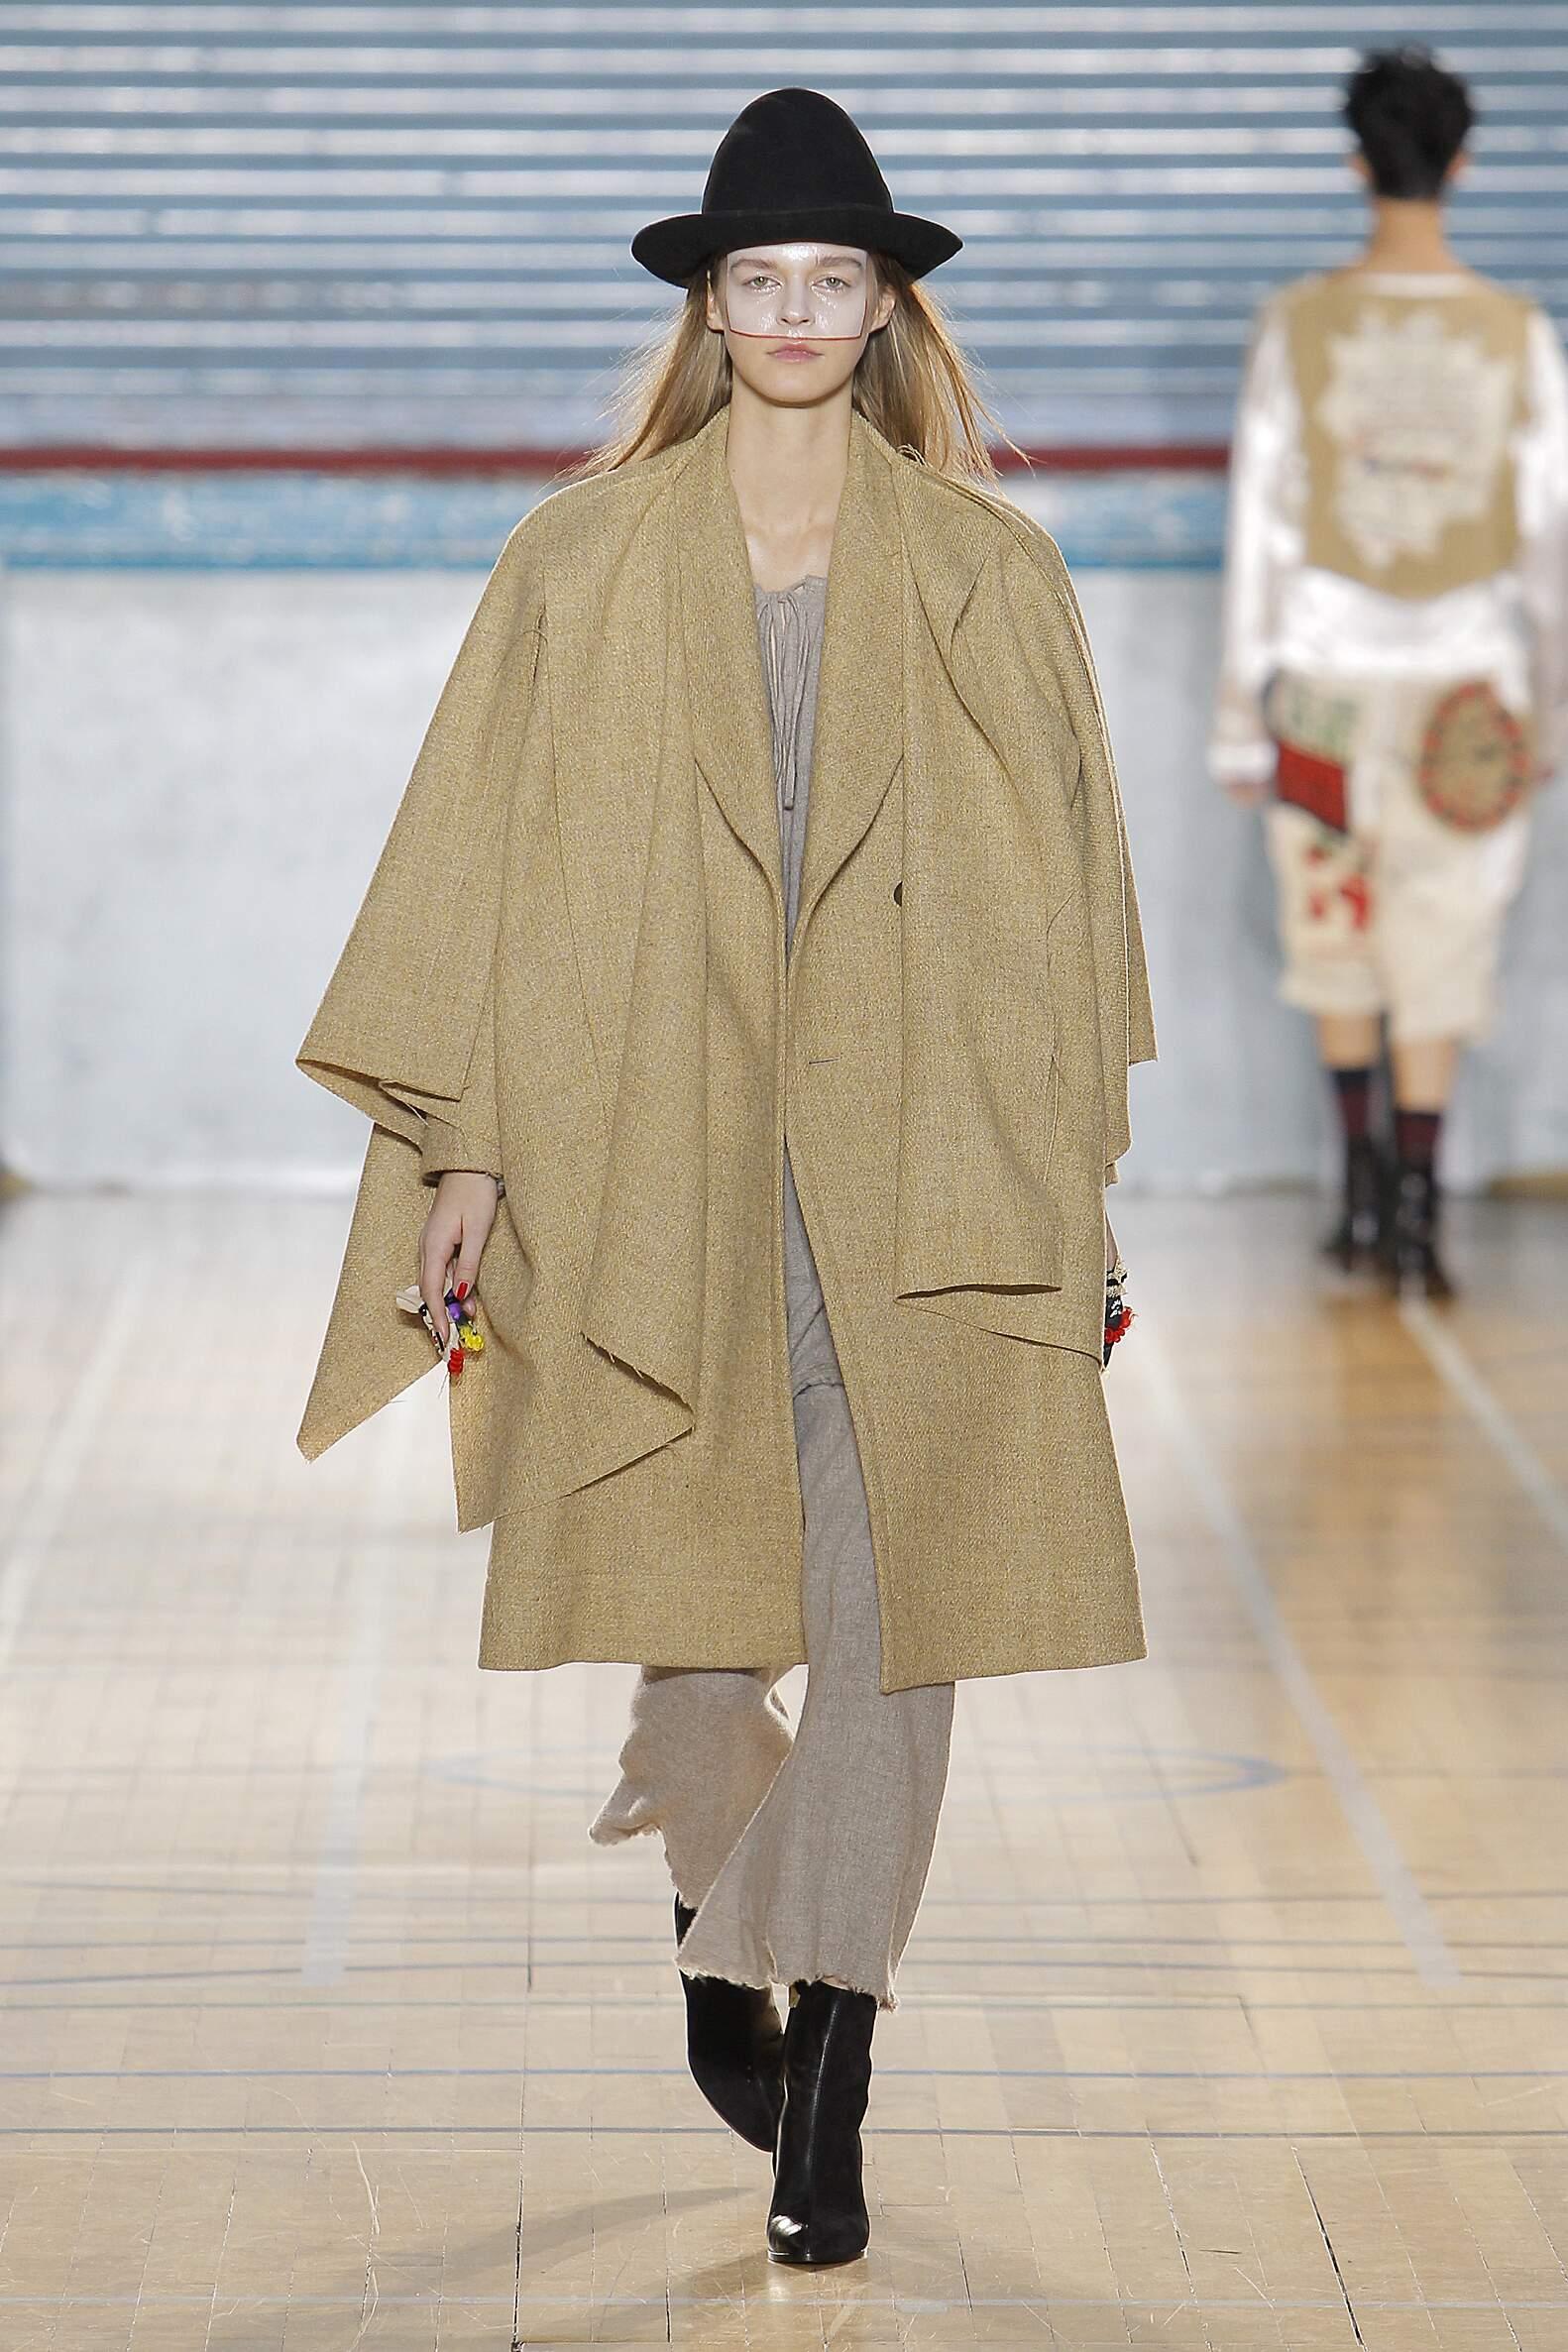 Vivienne Westwood Fall 2017 Catwalk